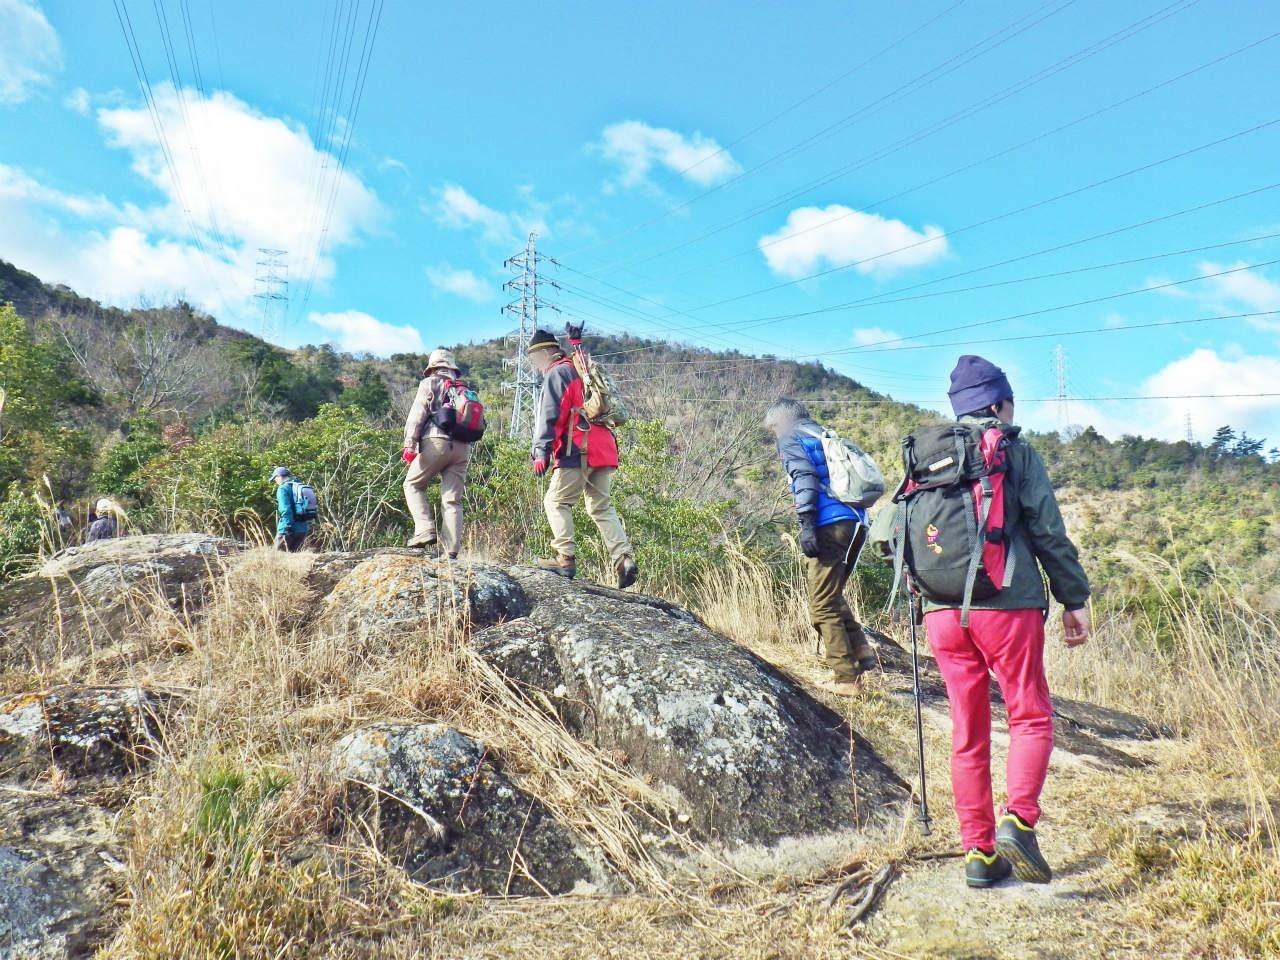 03a 岩場を進む